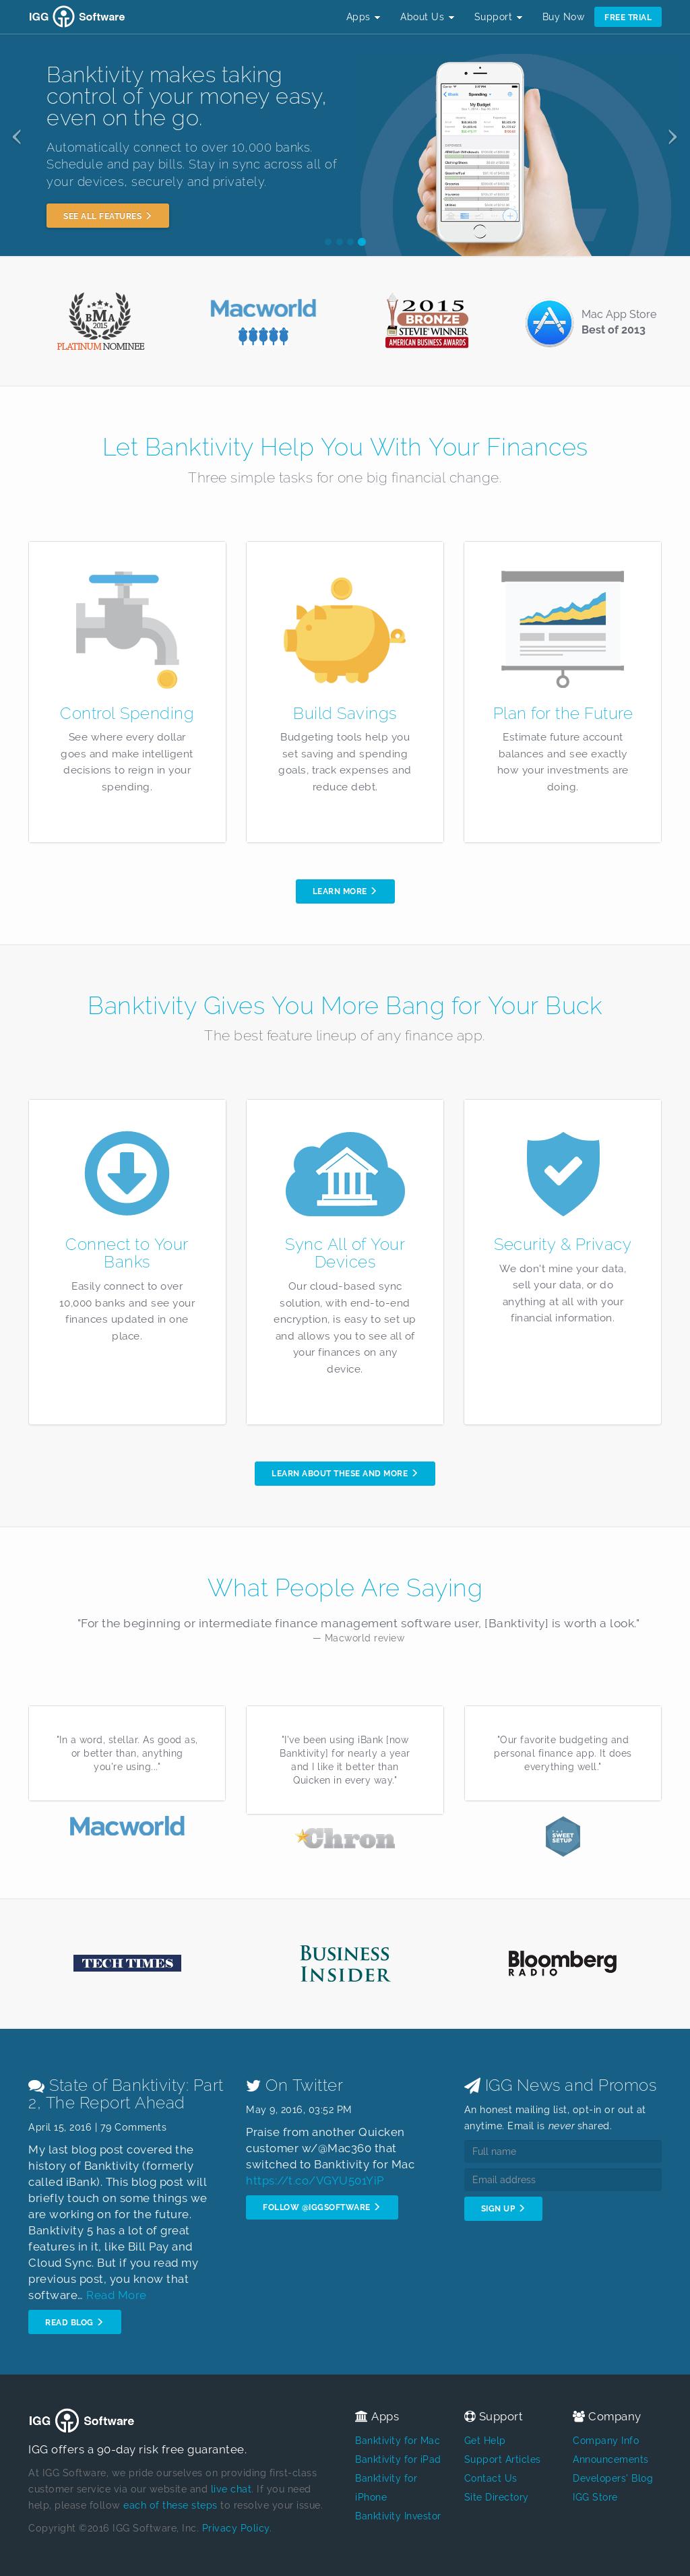 Owler Reports - IGG Software Blog Introducing Banktivity 7